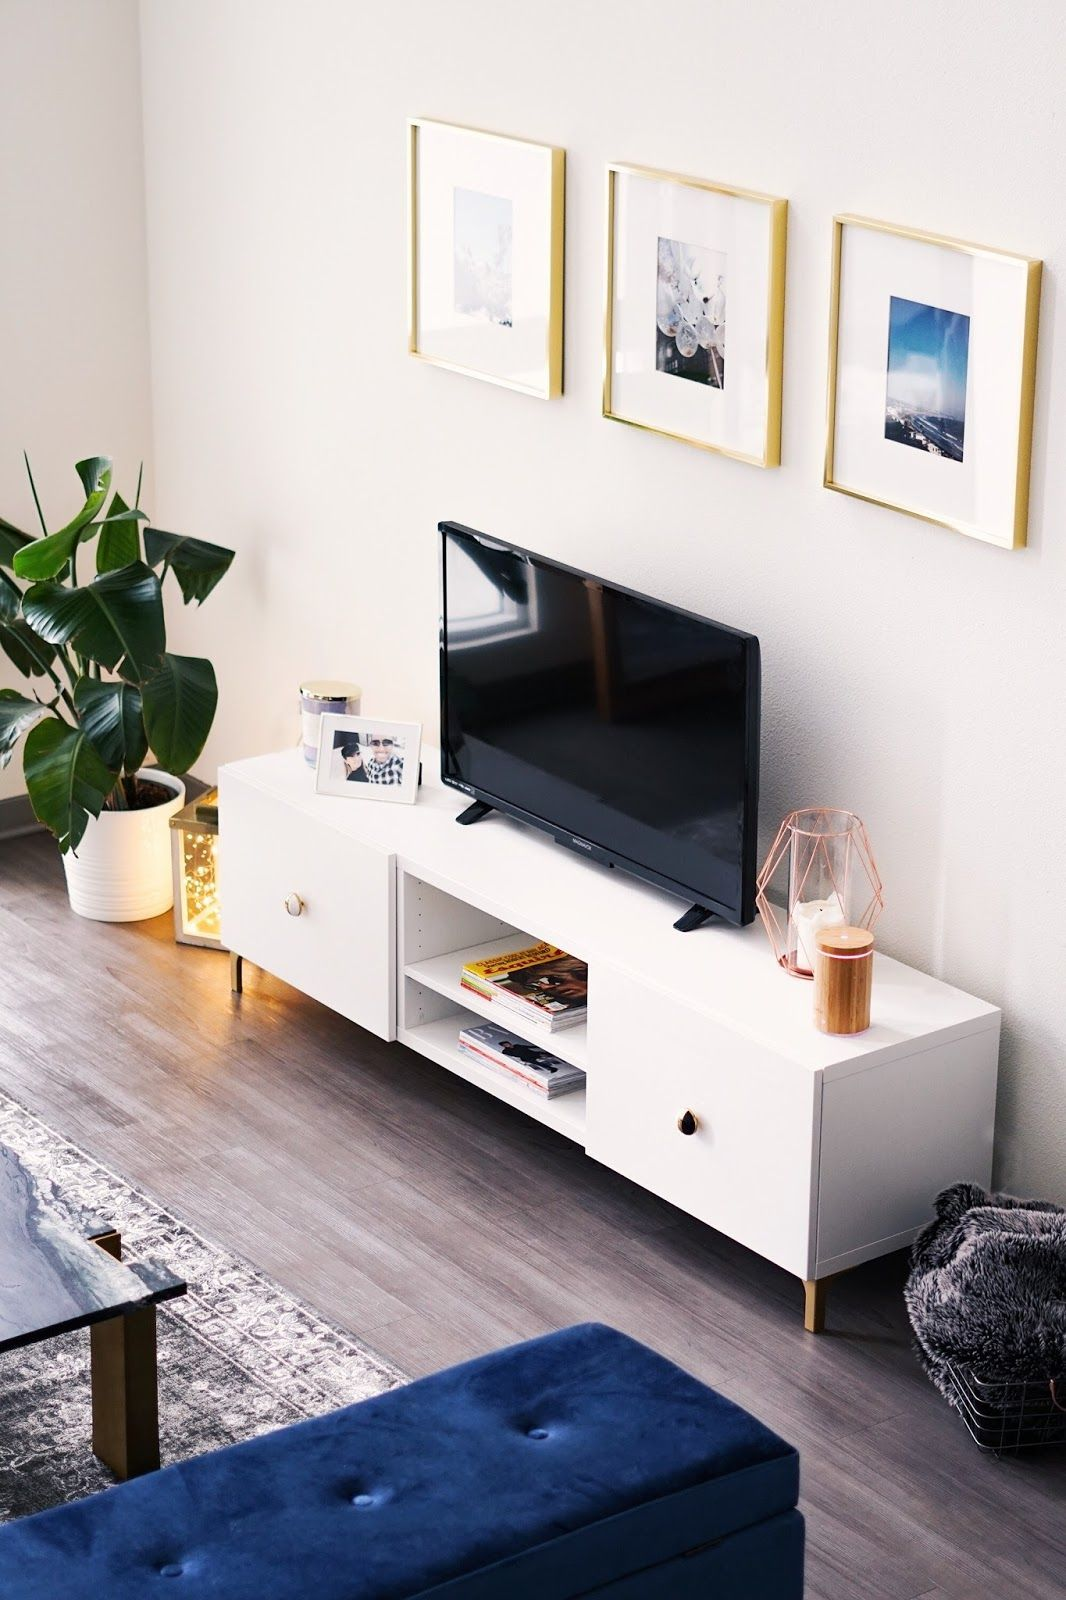 The Easiest Ikea Furniture Hack Www Parmidakiani Com Ikea Furniture Hack Ikea Tv Stand Tv Stand Decor Living Room Living Room Tv Stand Ikea Living Room